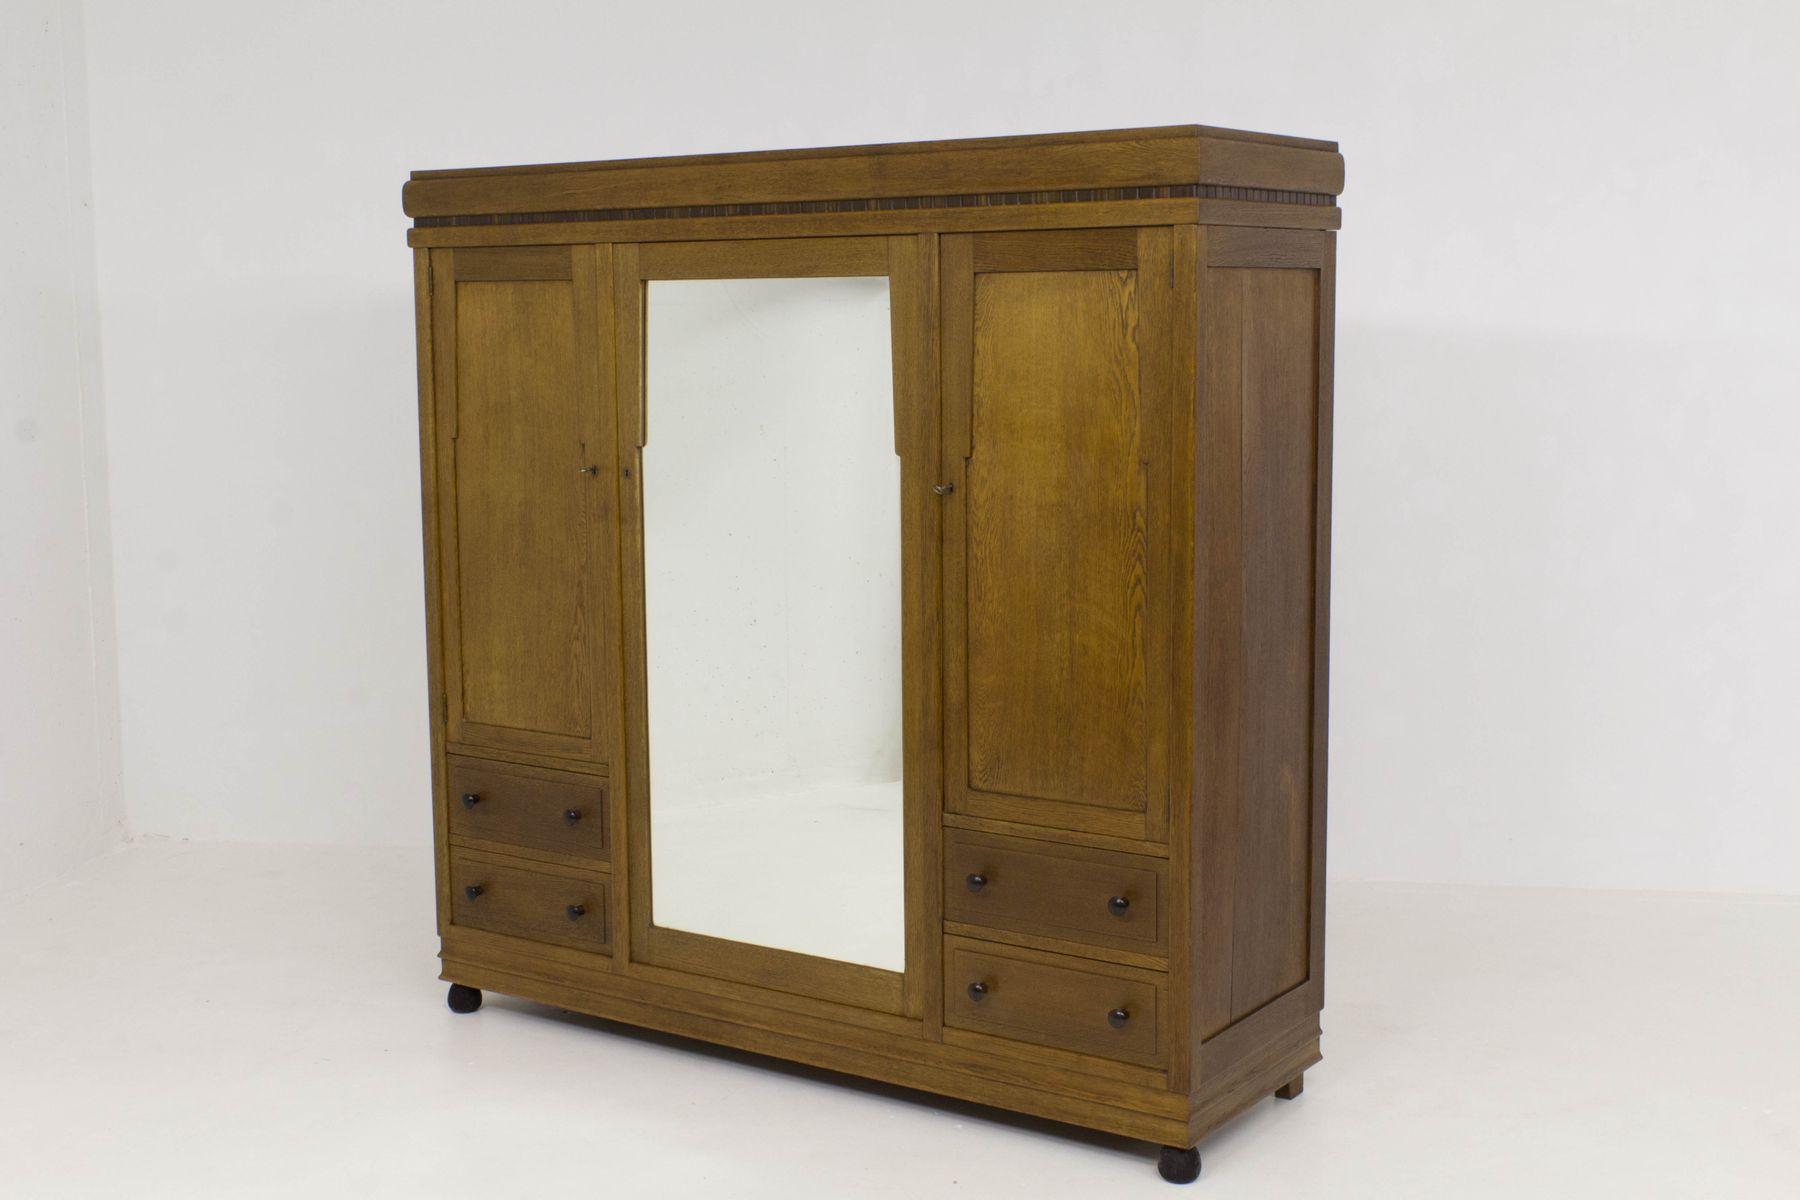 art deco amsterdam school wardrobe 1920s for sale at pamono. Black Bedroom Furniture Sets. Home Design Ideas